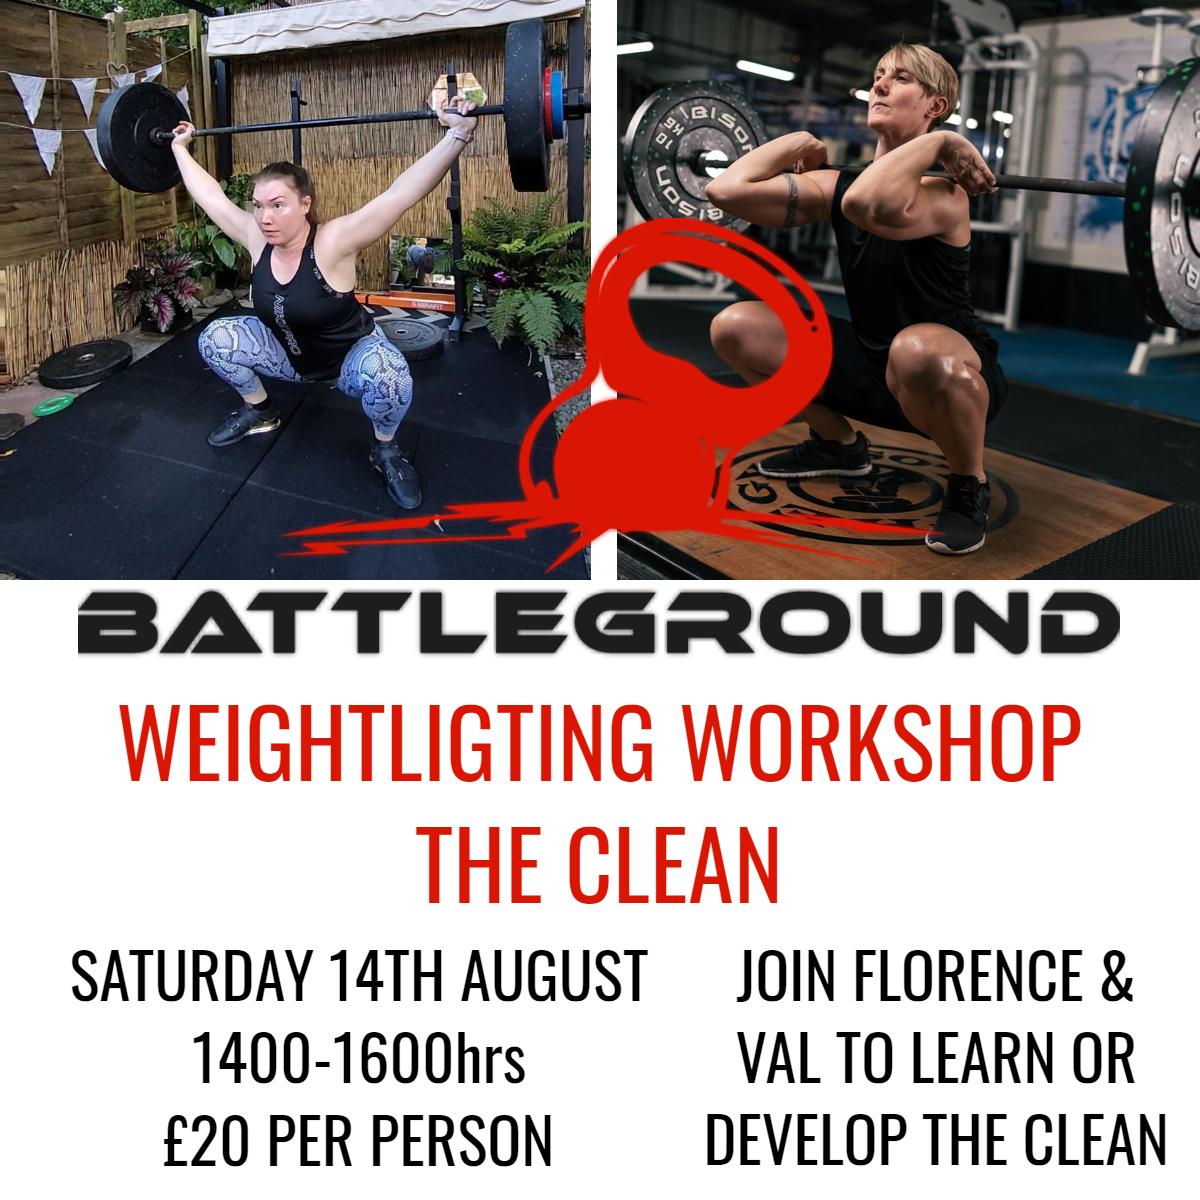 The Clean - Weightlifting Workshop